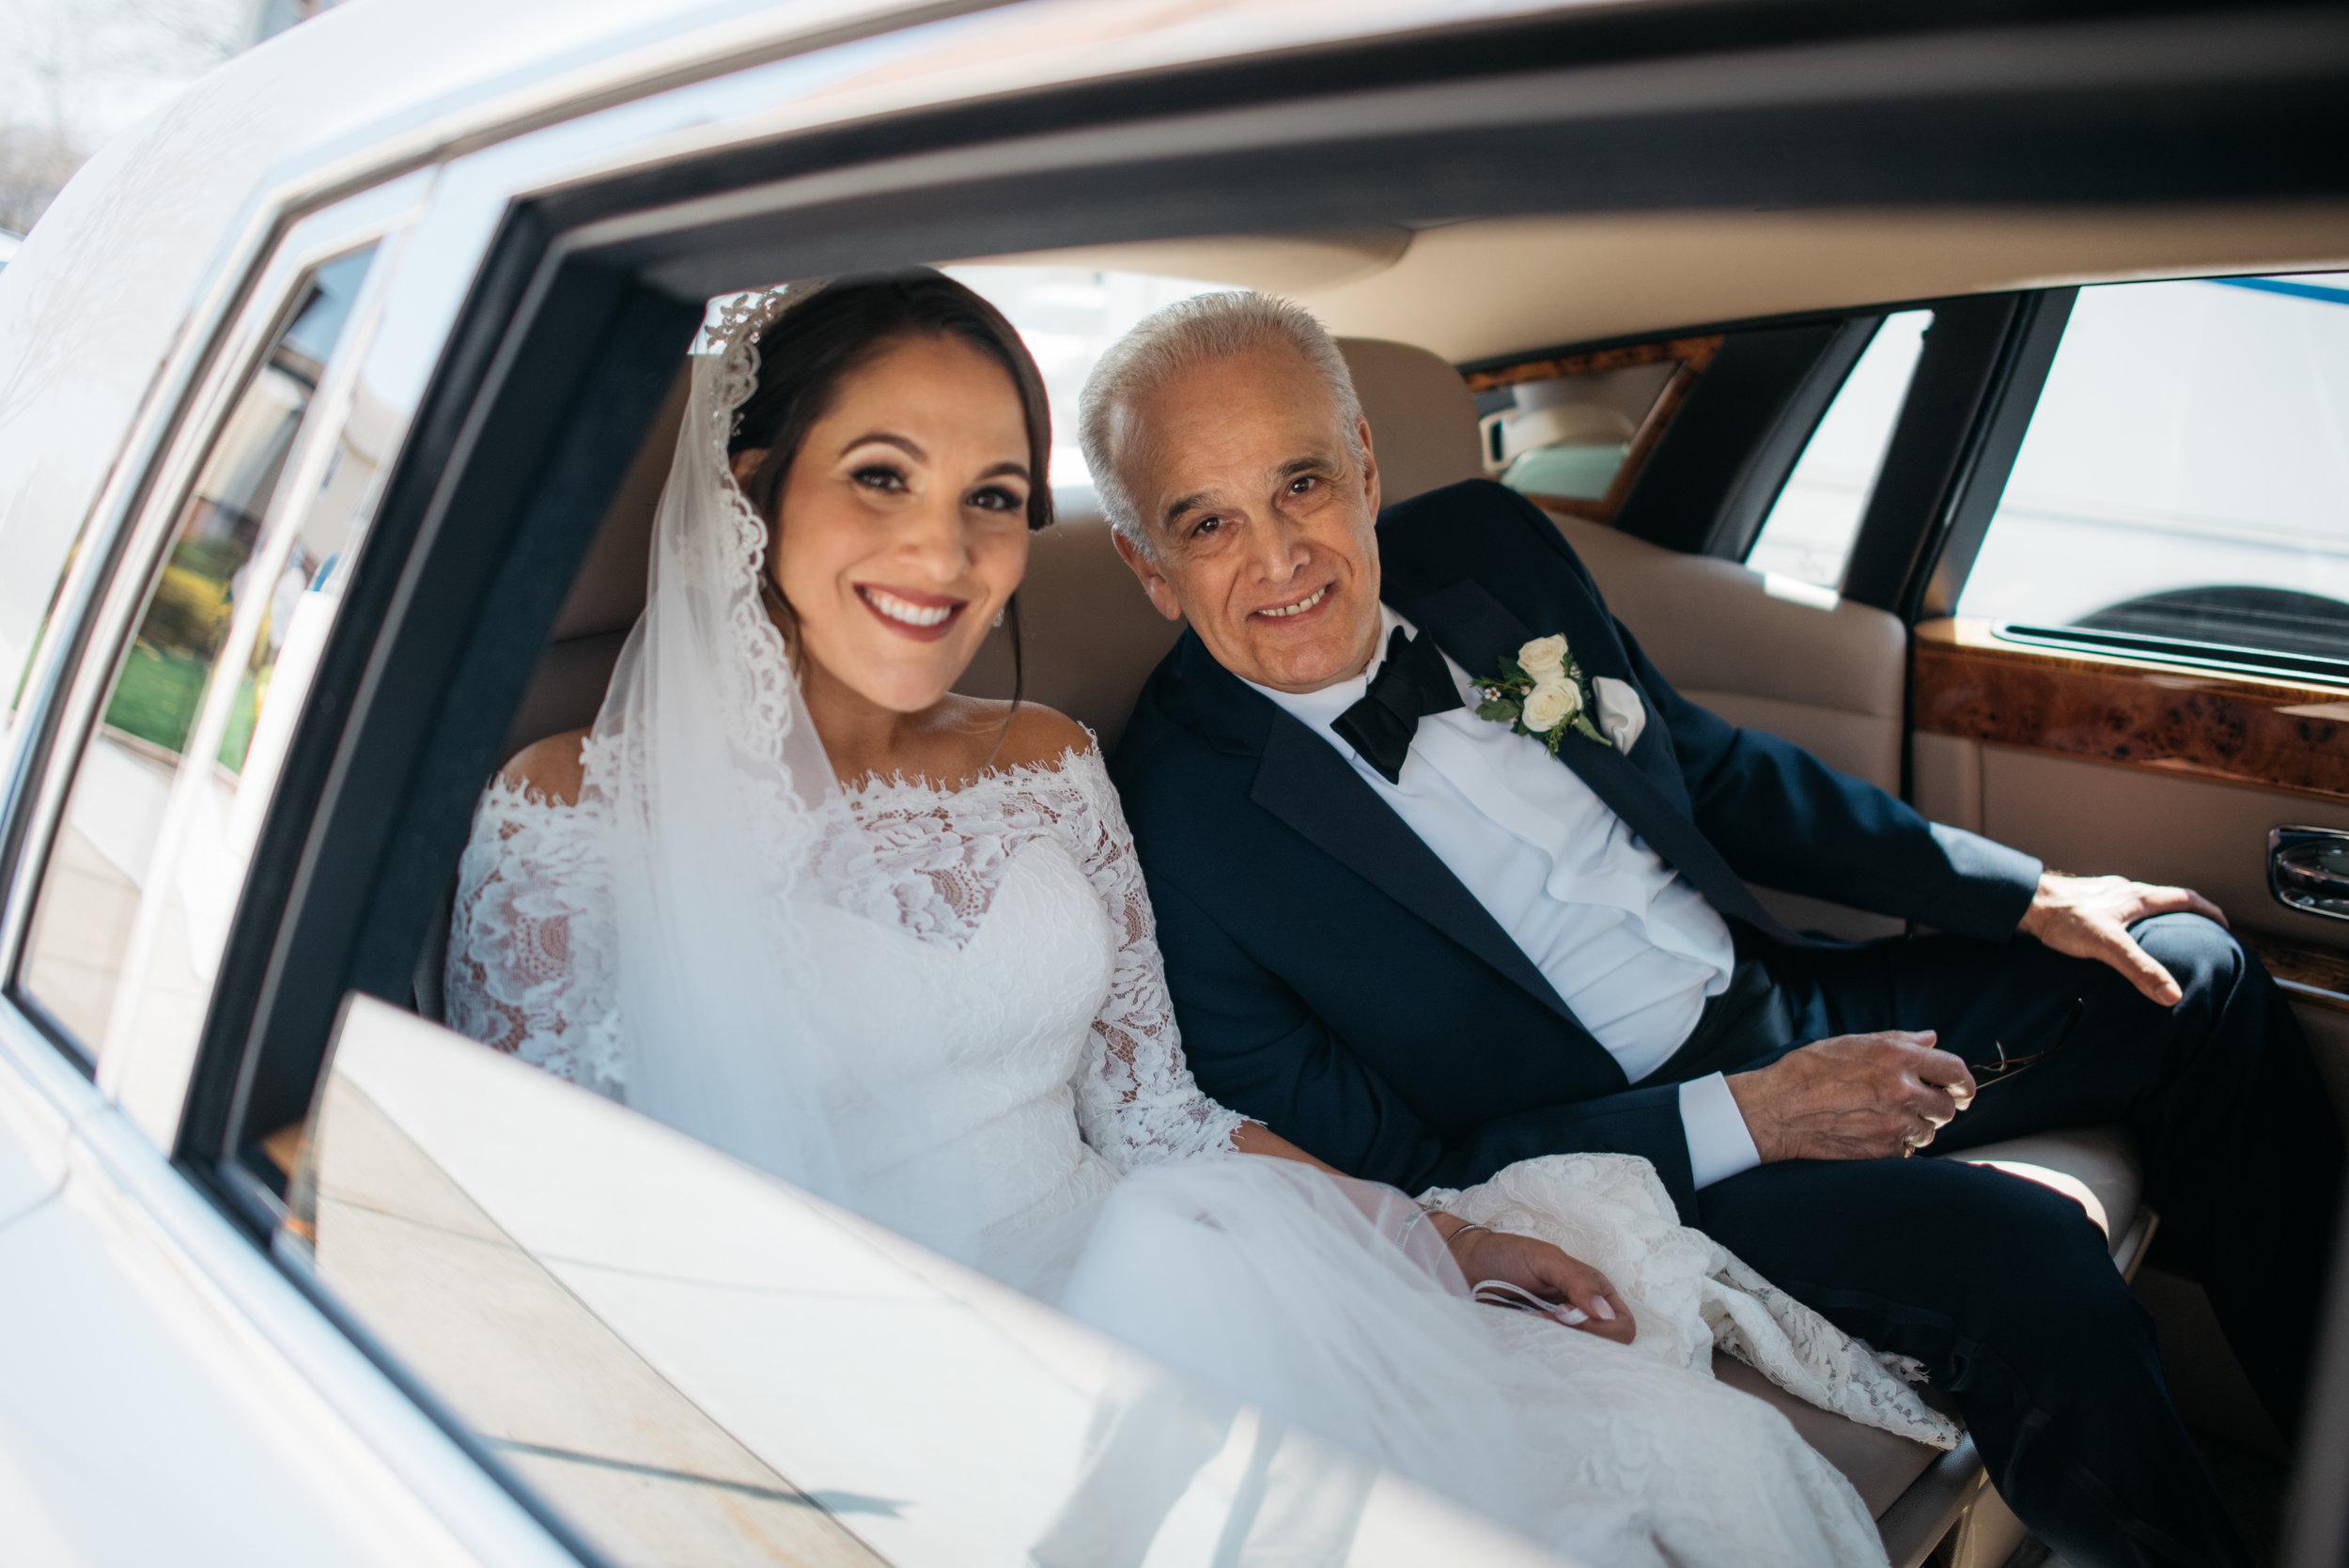 WeddingPhotos | NJPhotographer | Highlights-1-49.jpg